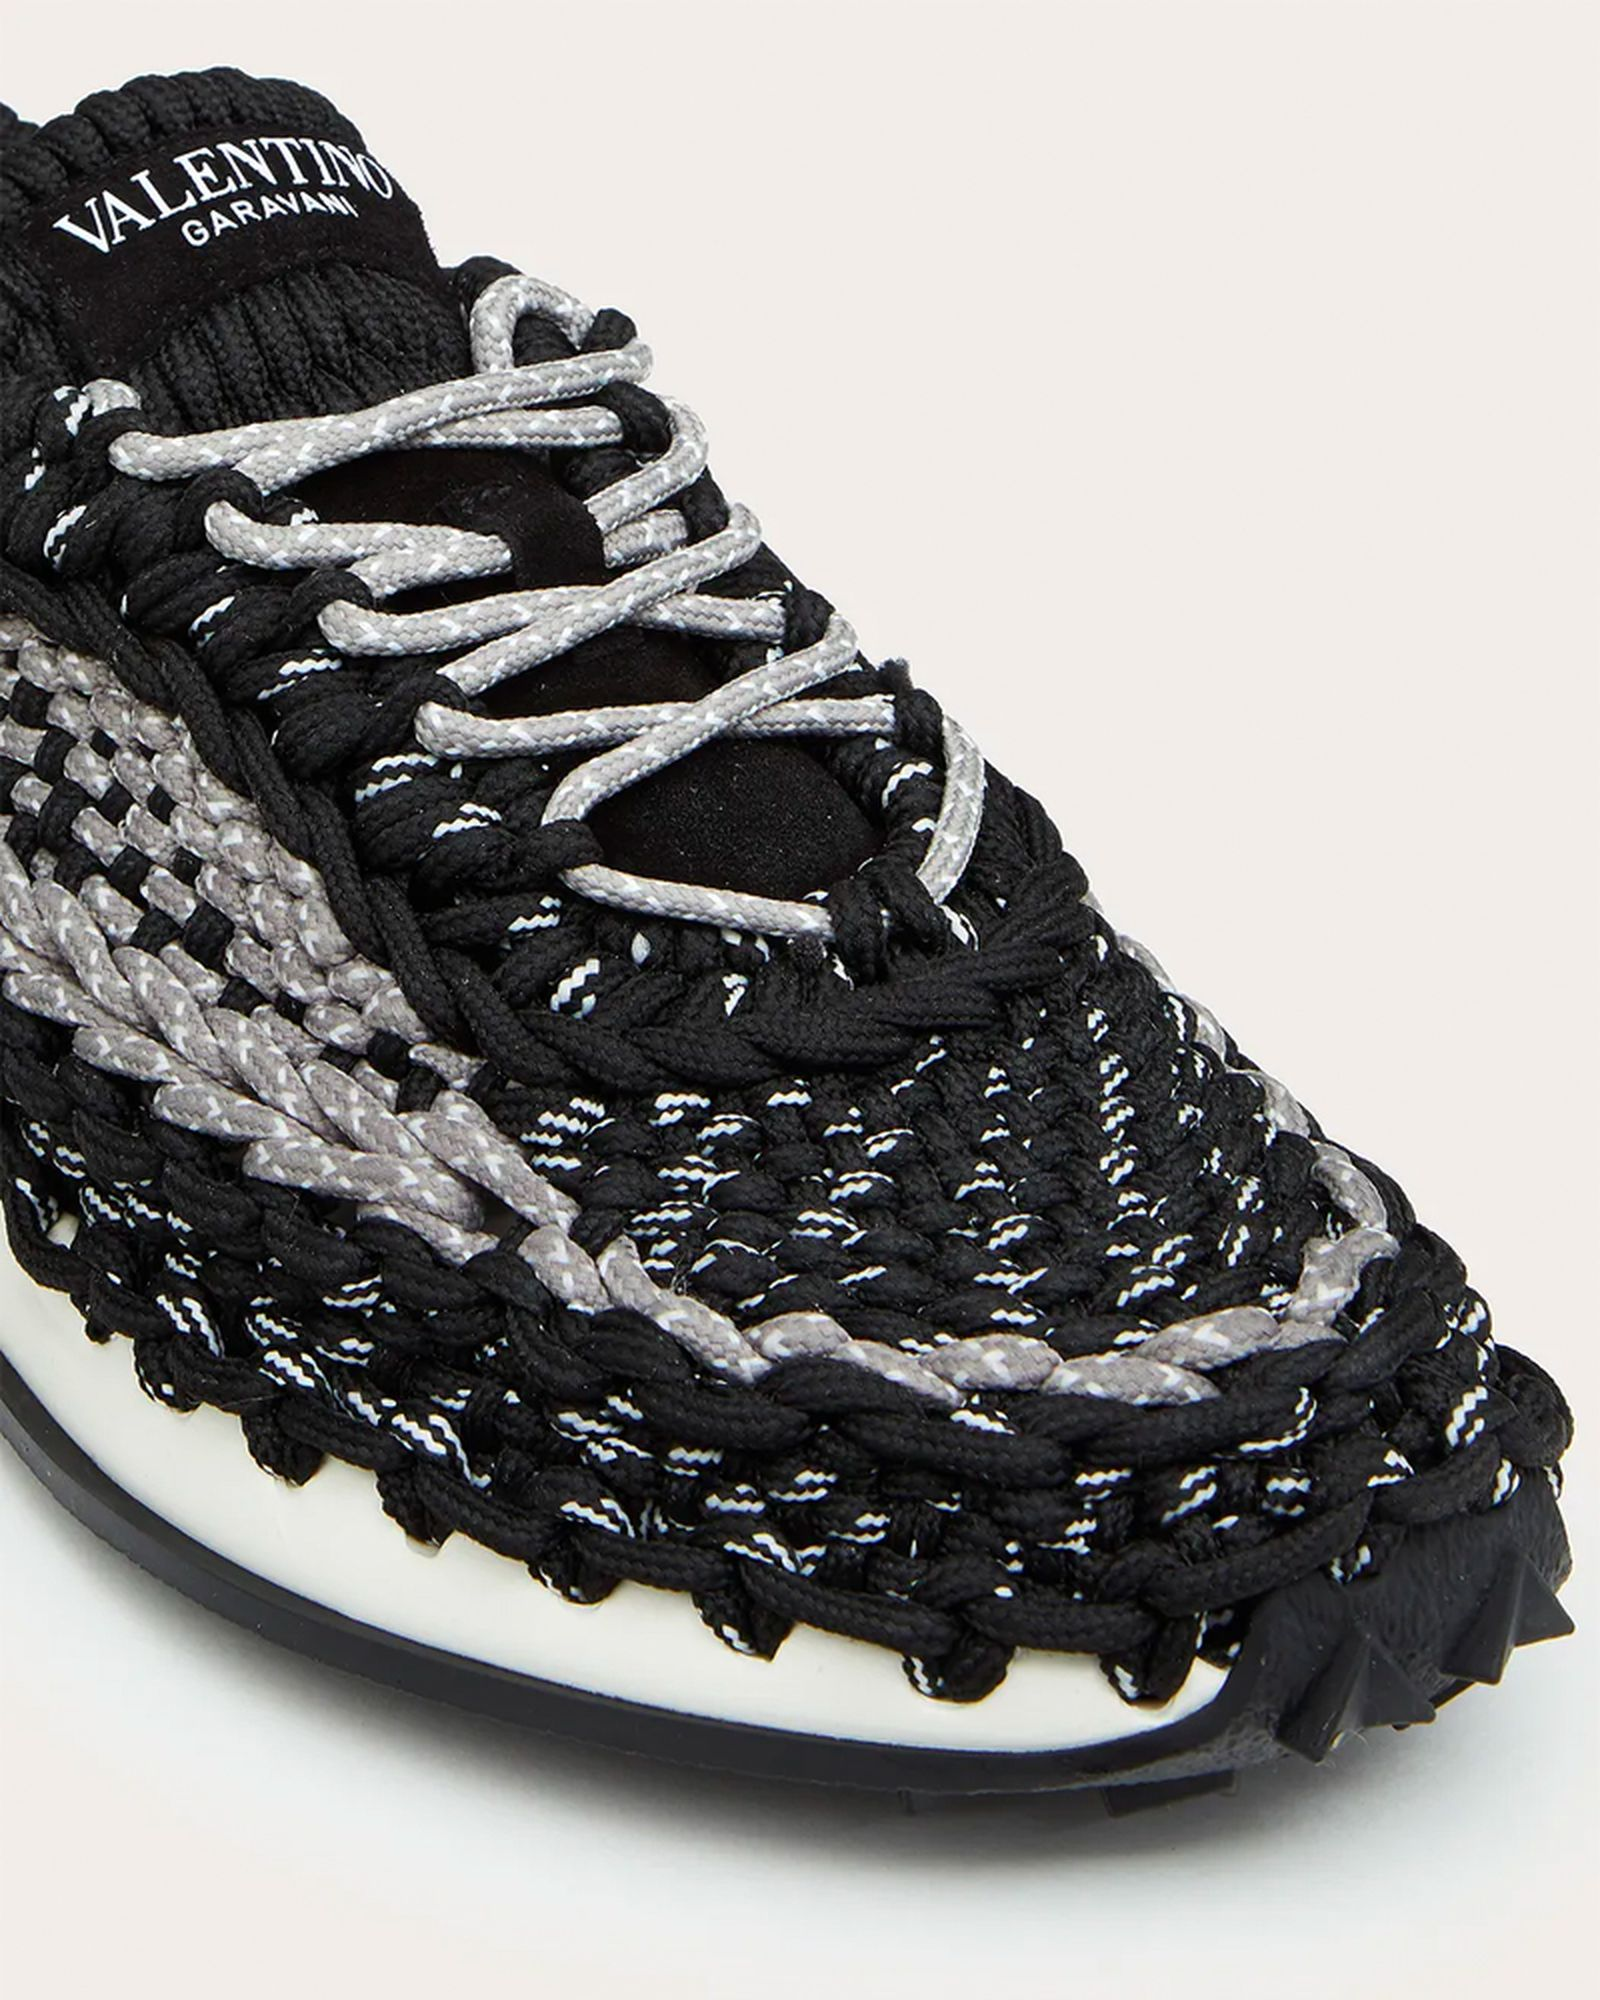 valentino-garavani-crochet-sneakers-release-date-price-04